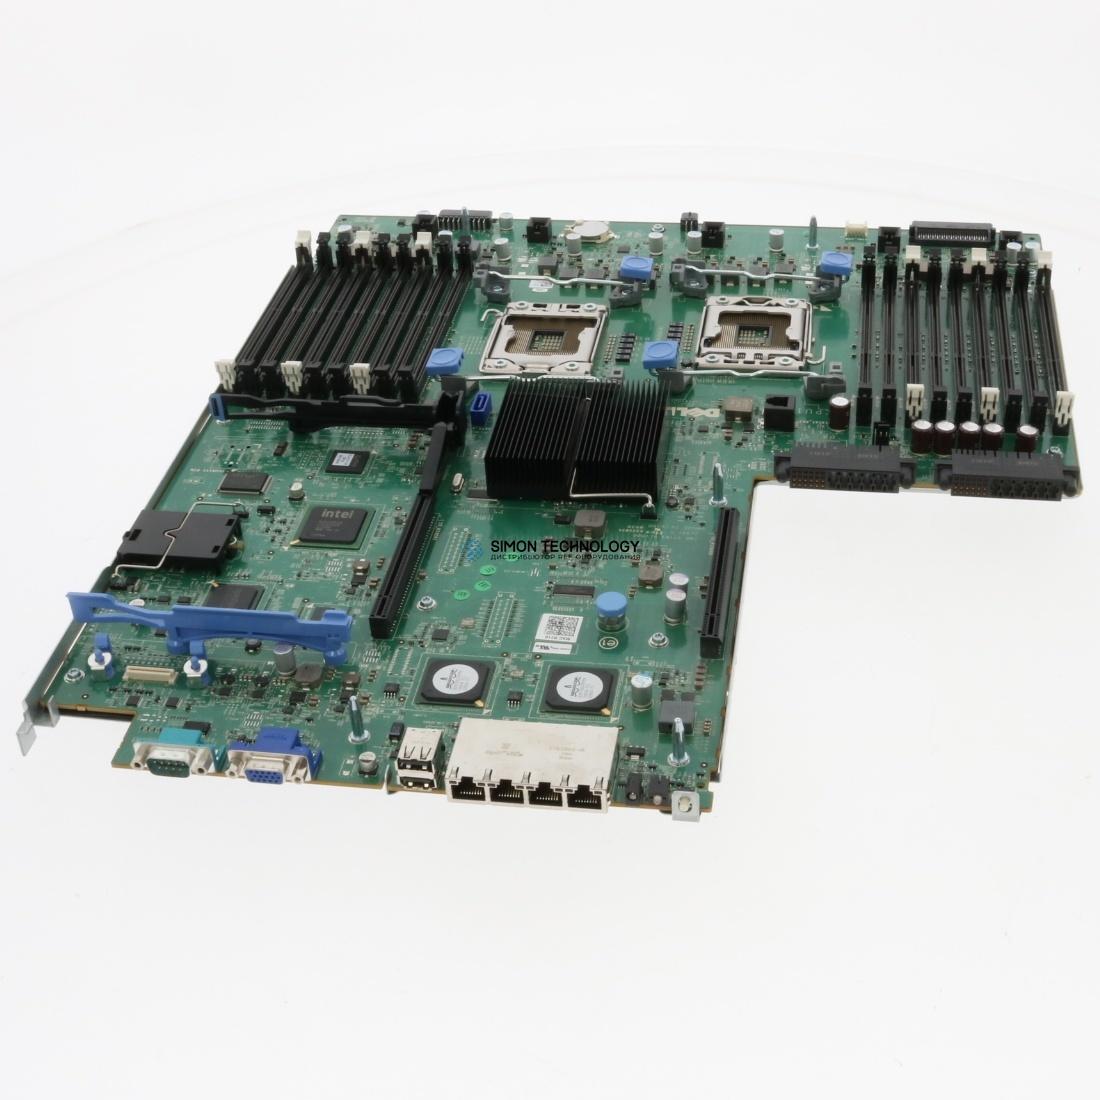 Материнская плата Dell PowerEdge R710 8x2.5 HYPX2 Ask for custom qoute (PER710-SFF-8-HYPX2)